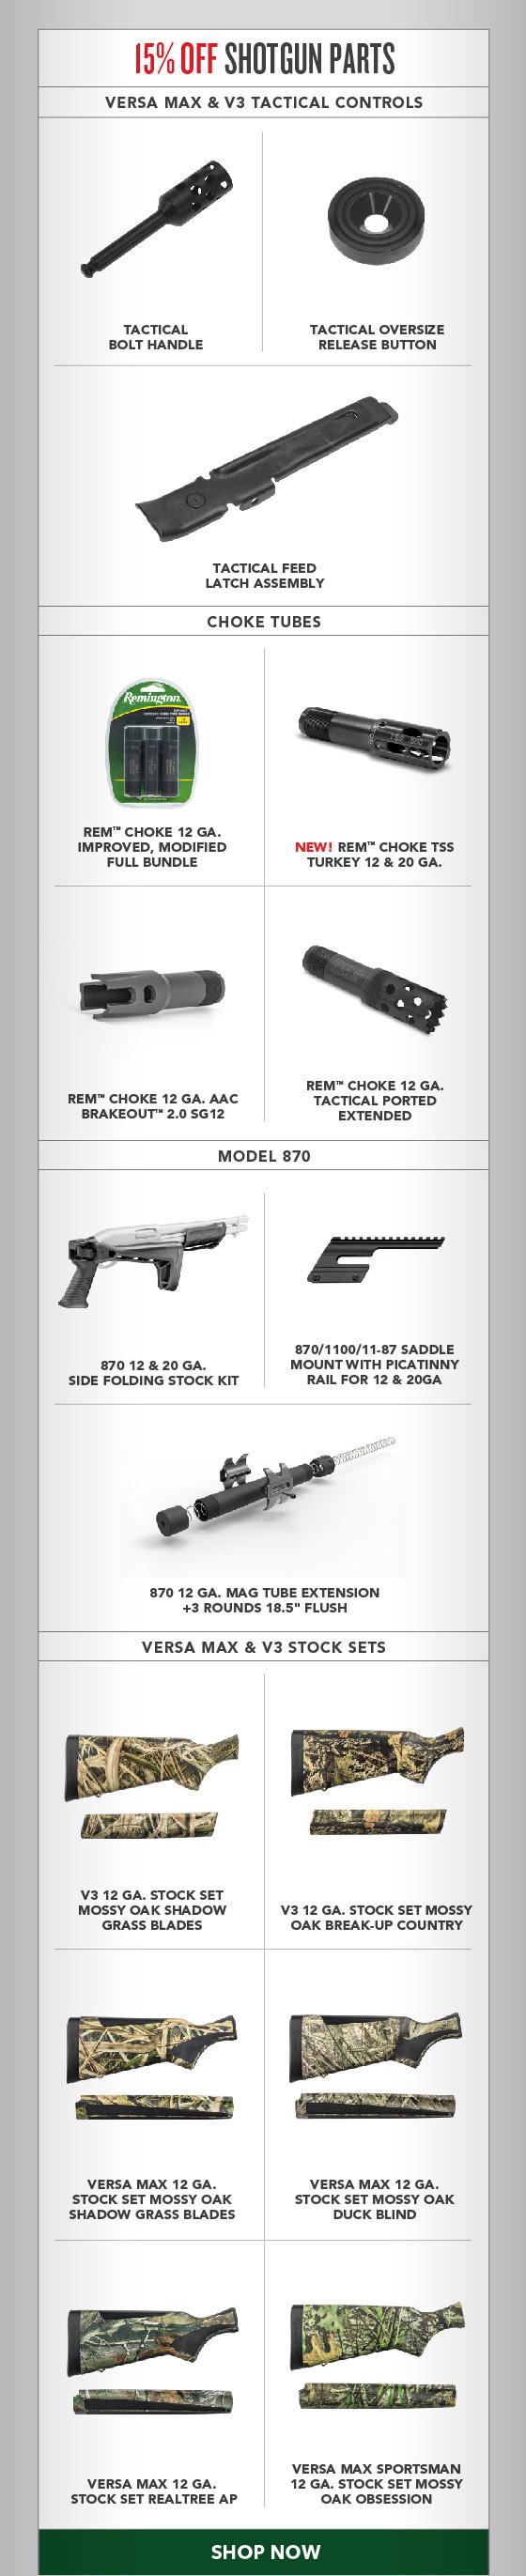 15% OFF Shotgun Parts